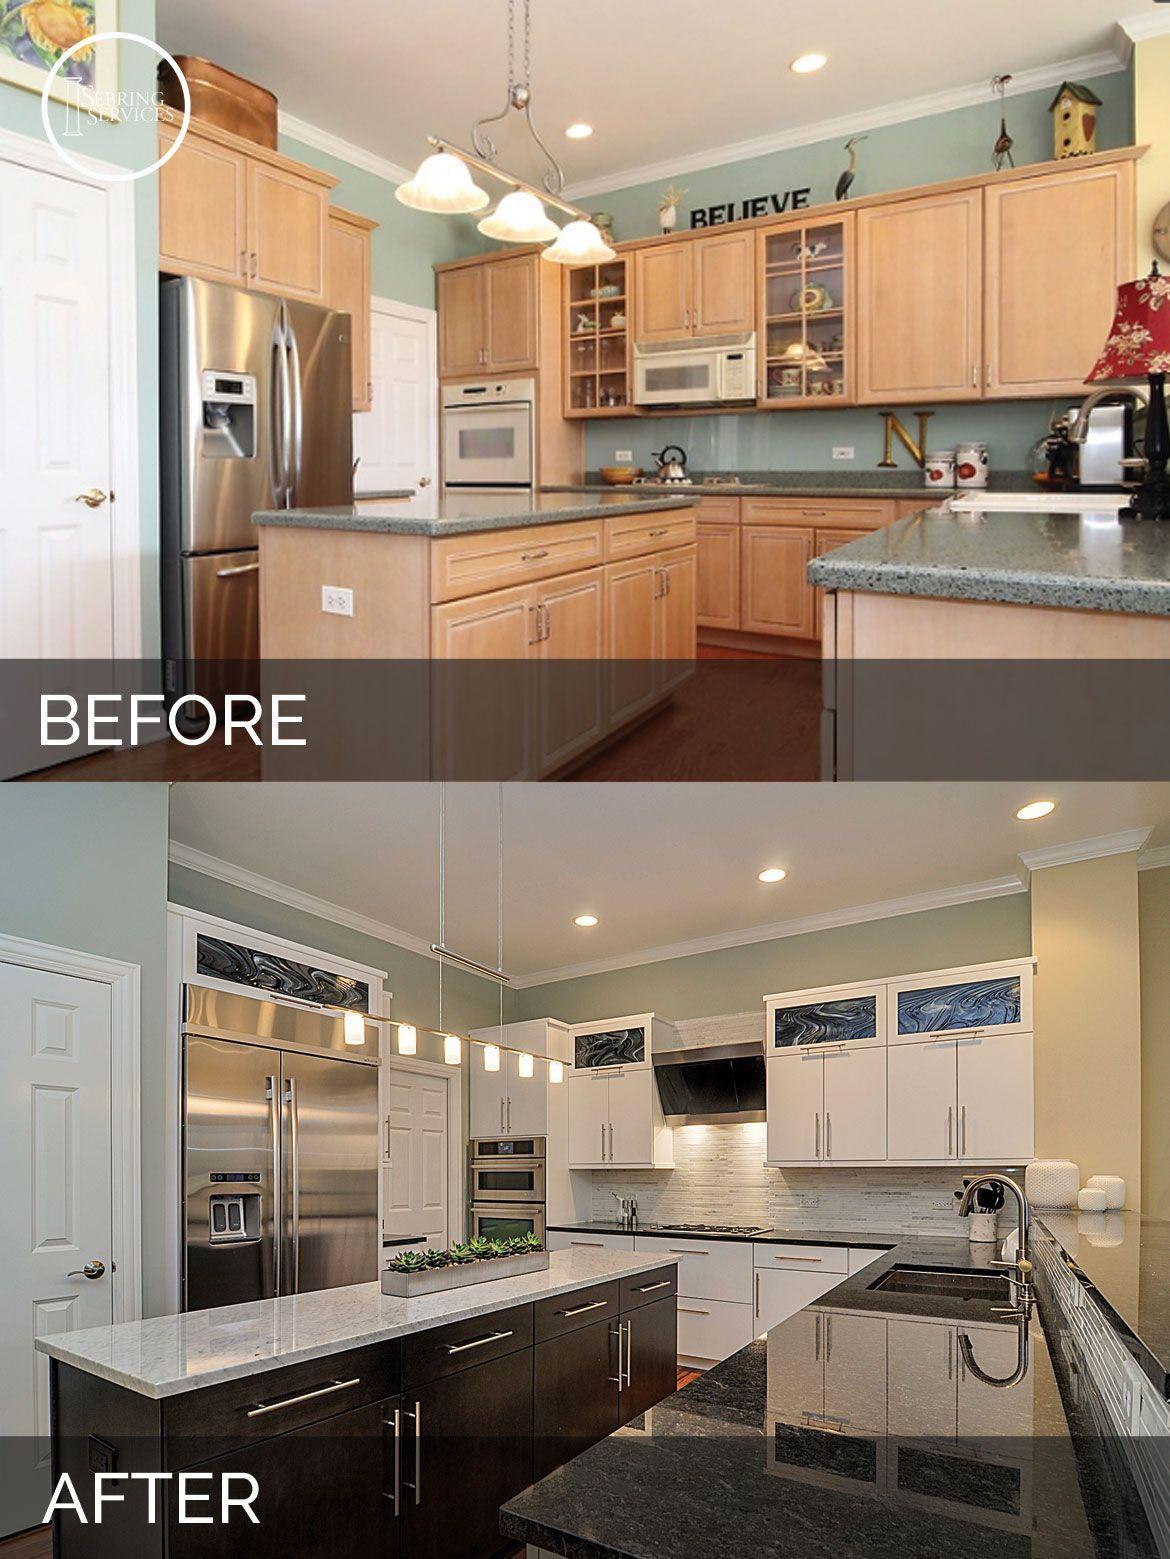 Doug & Natalie's Kitchen Before & After Pictures #homestagingavantapres